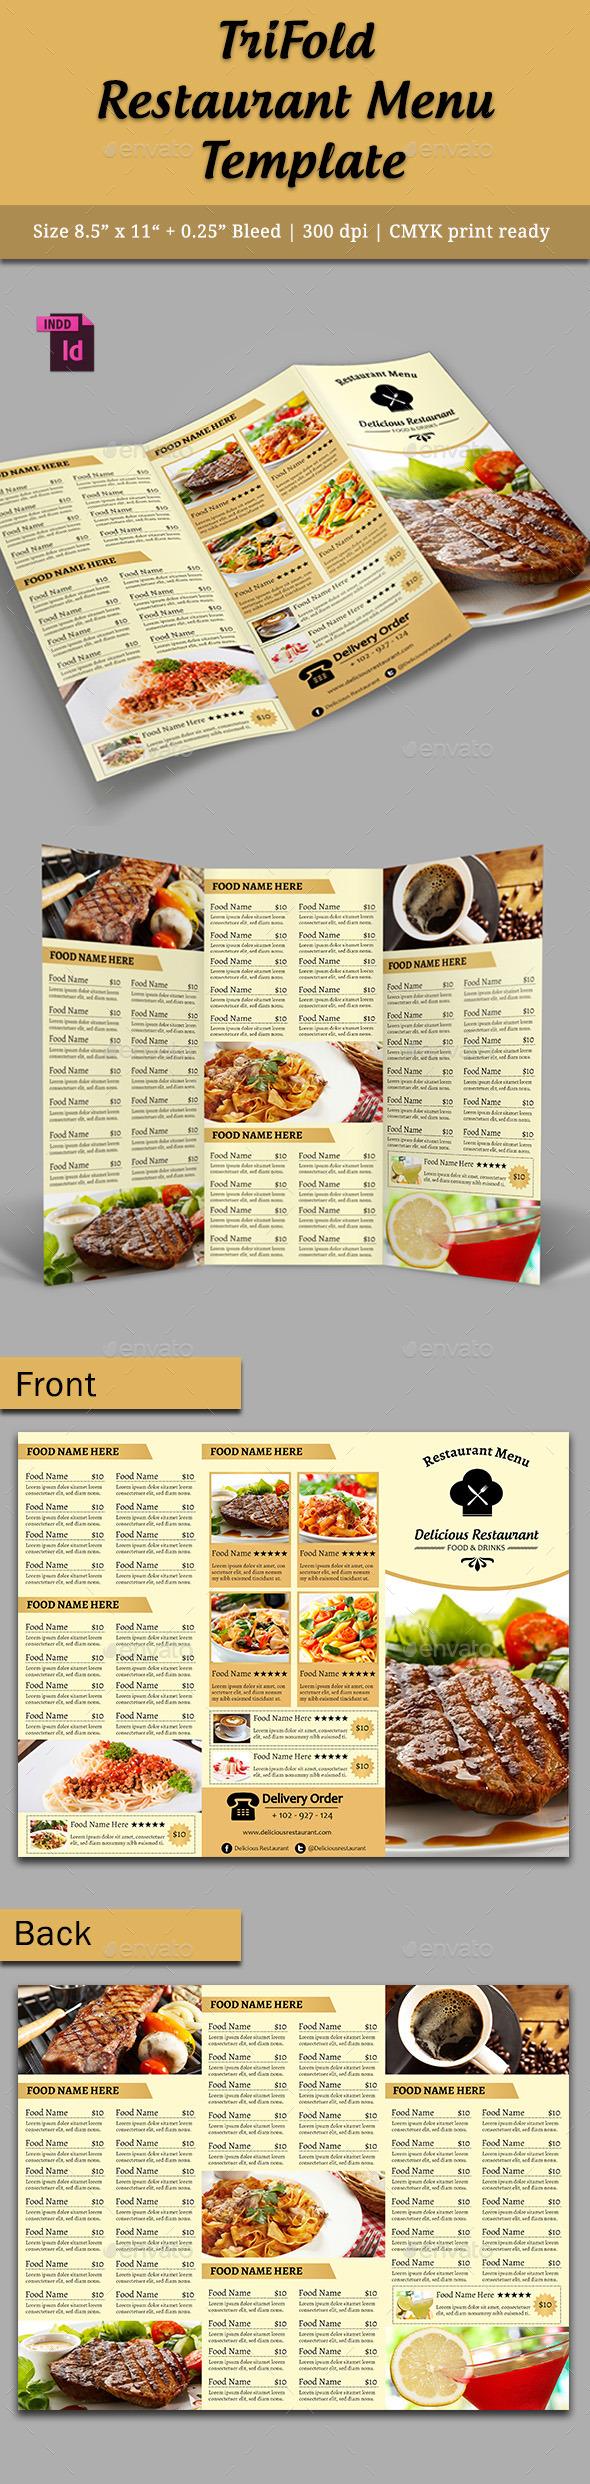 TriFold Restaurant Menu Template Vol. 5 - Food Menus Print Templates